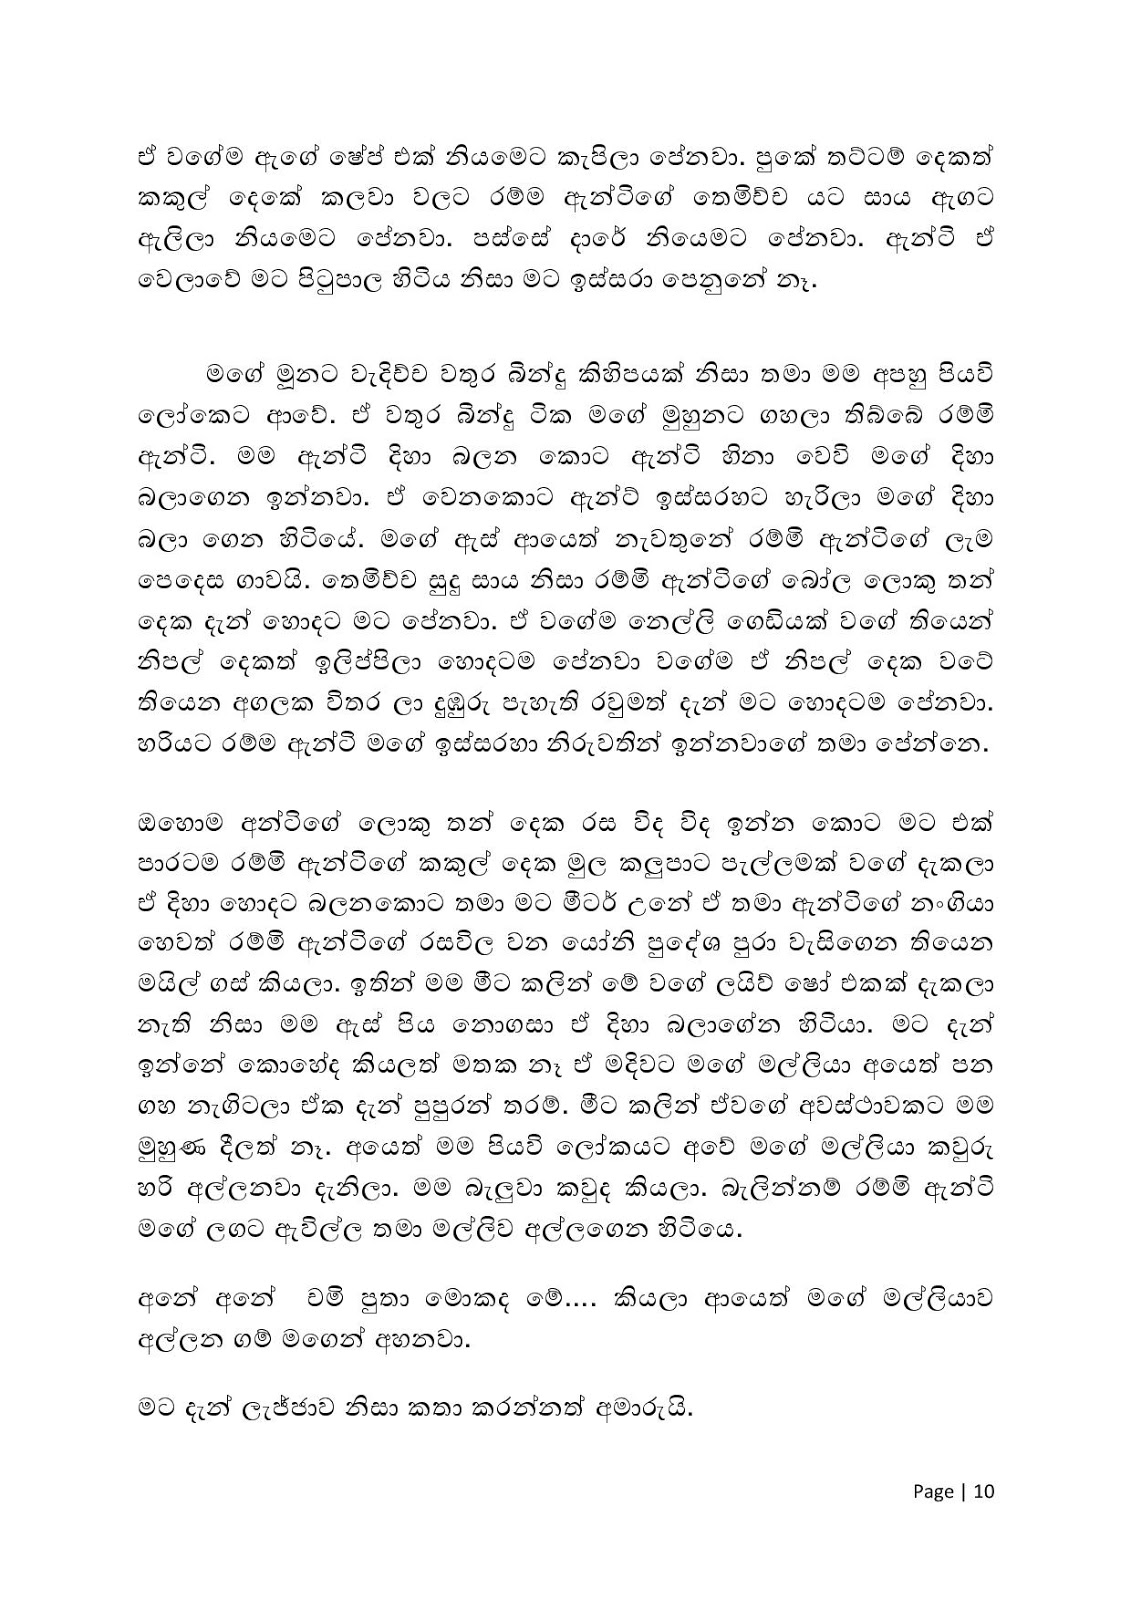 Pipunu malak 1 sinhala wela katha and wala katha stories sinhala